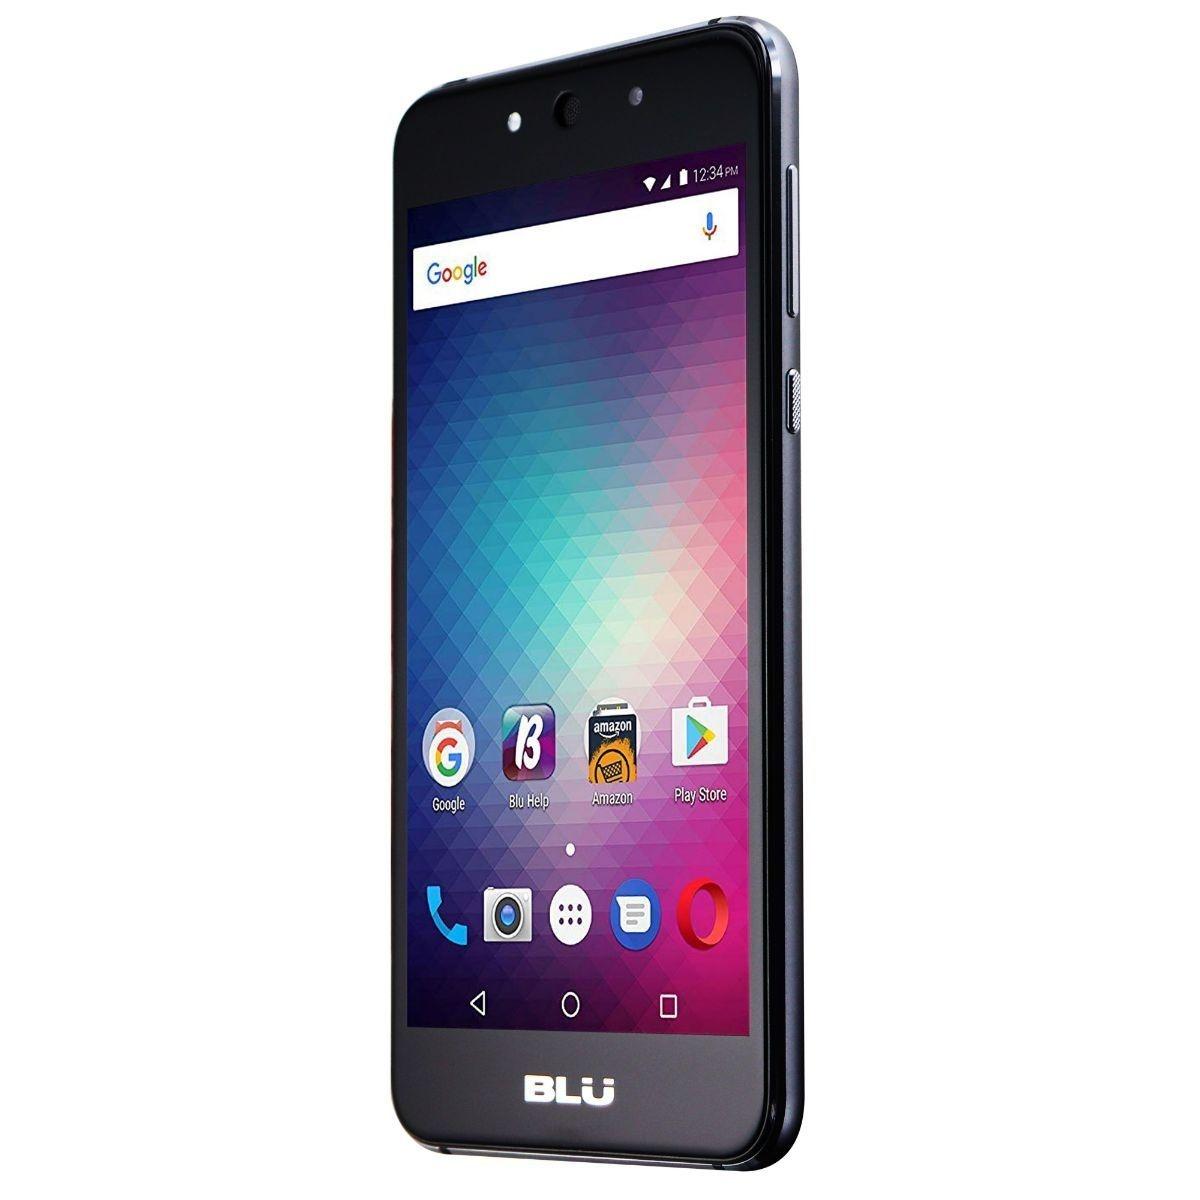 BLU Grand Max Smartphone (G110Q) International GSM Unlocked - 8GB / Gray